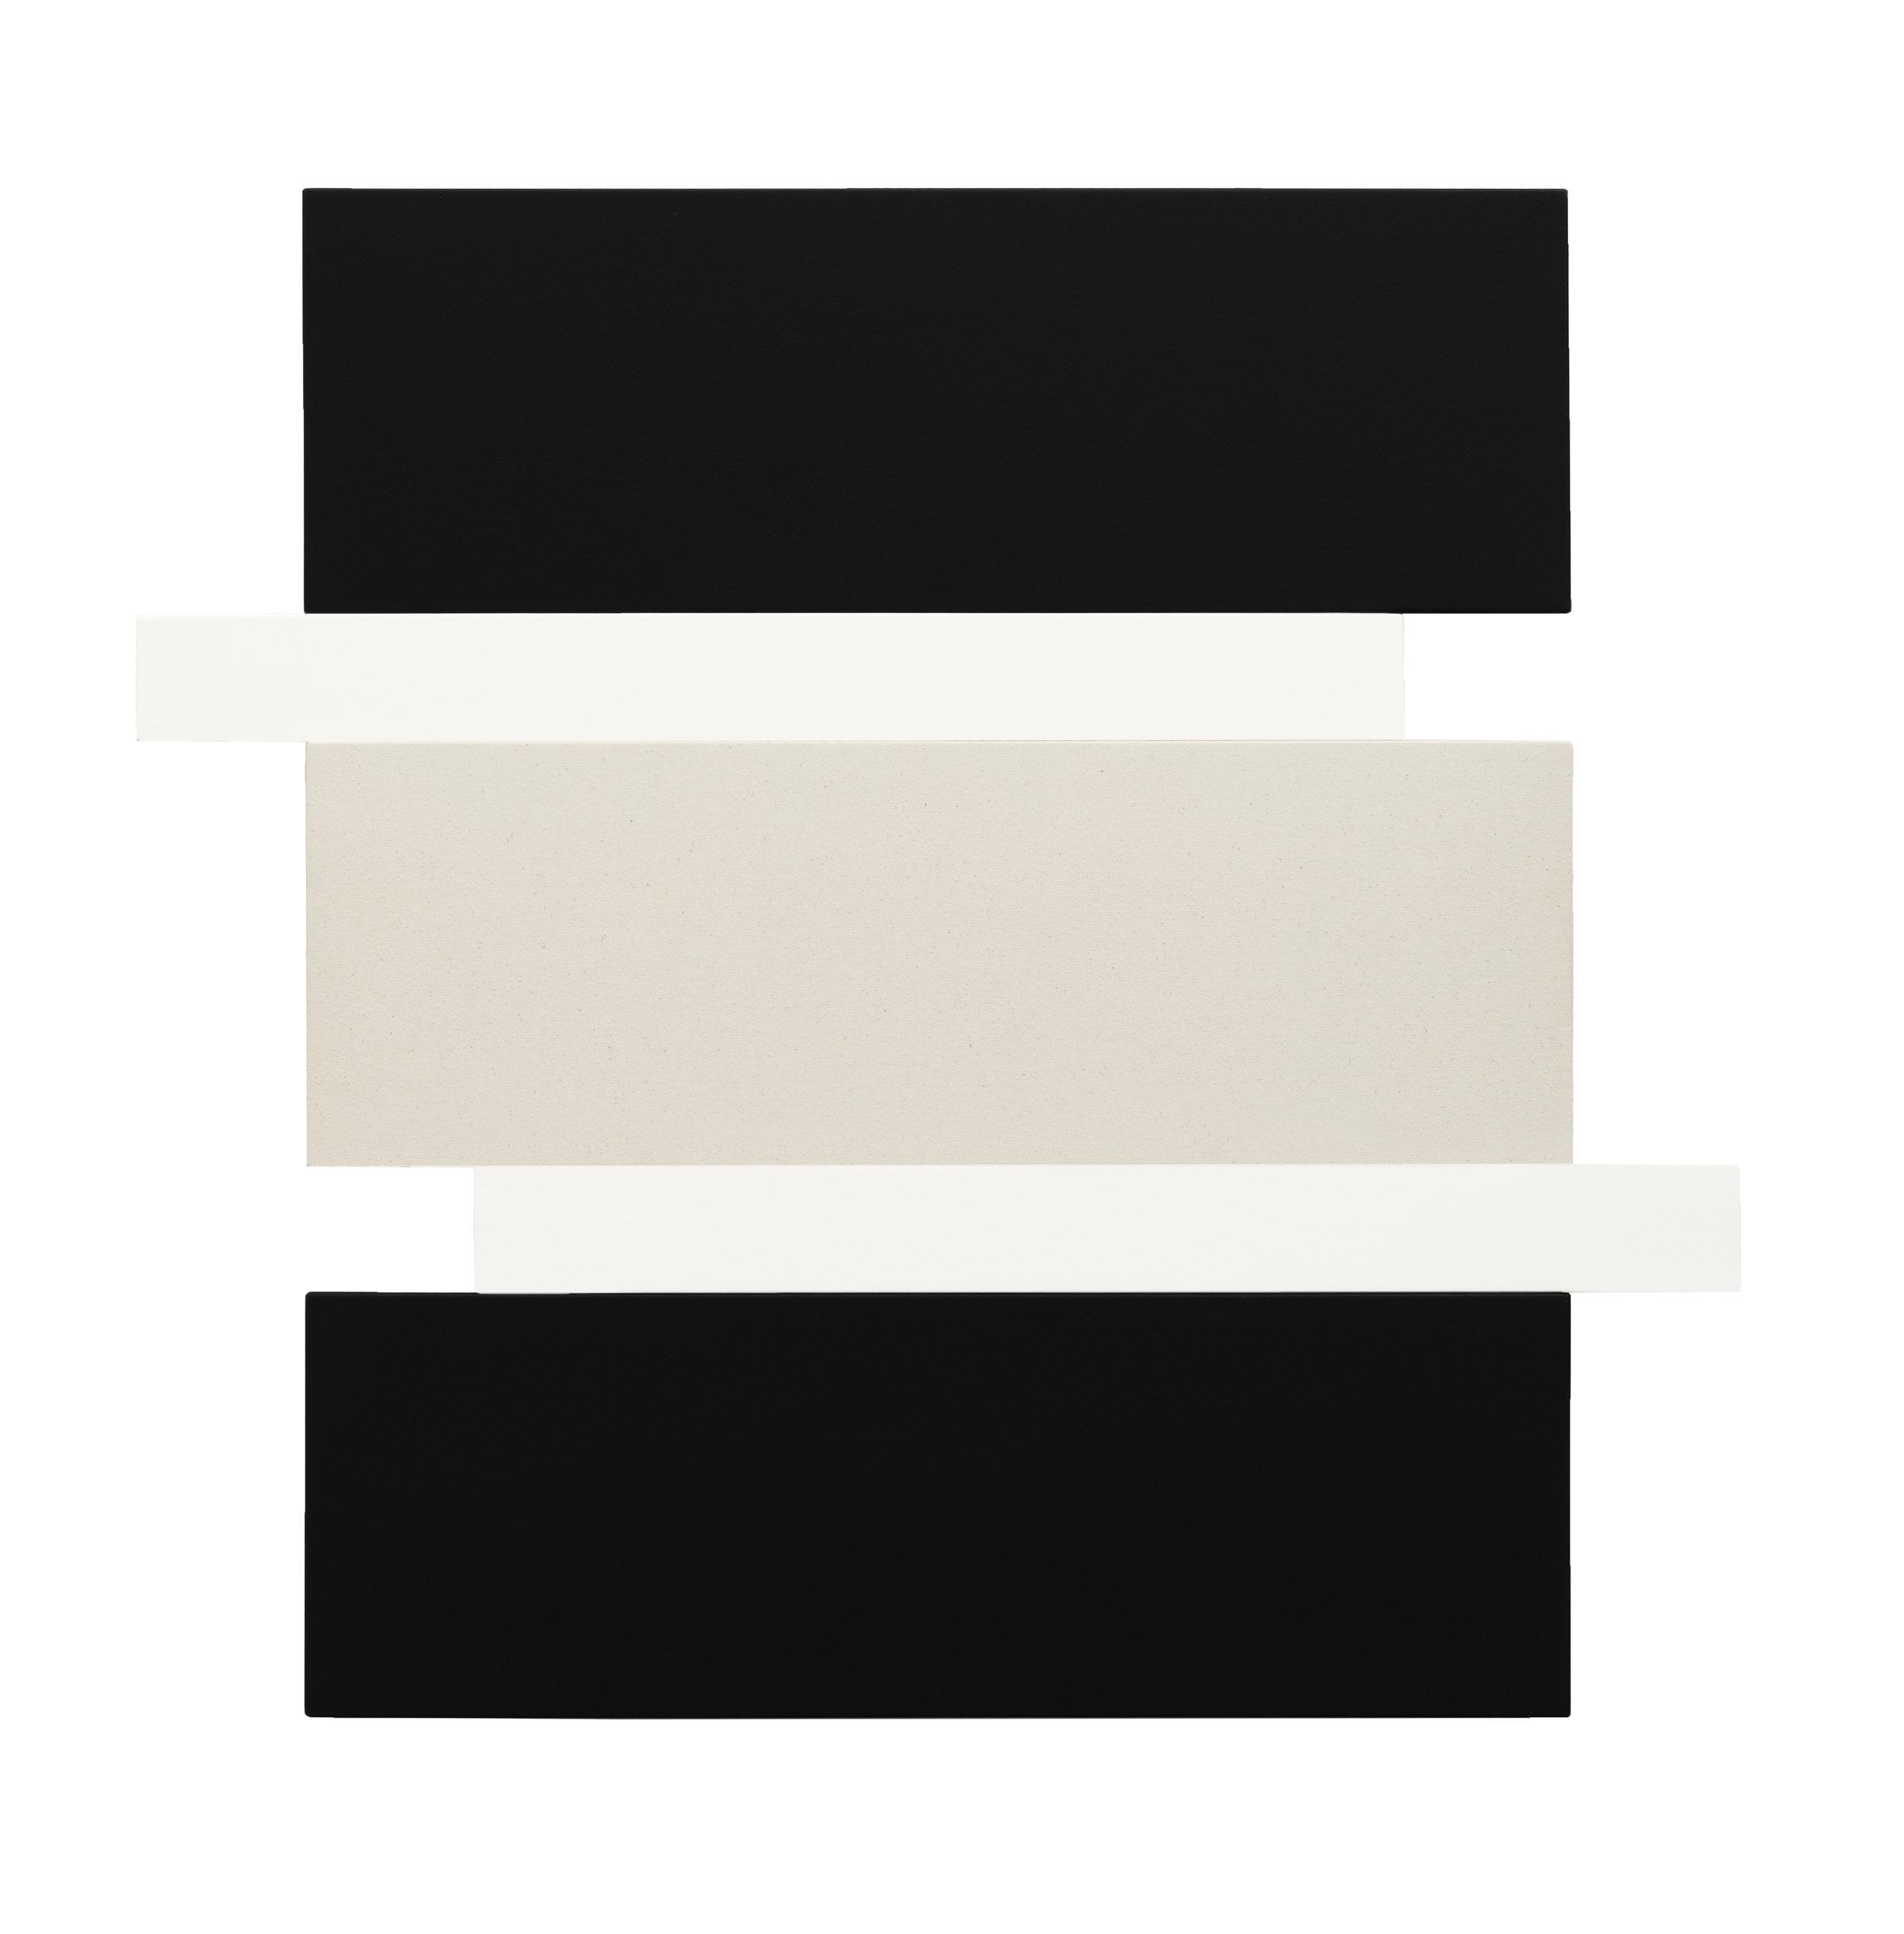 STACK - BLACK, WHITE, CANVAS